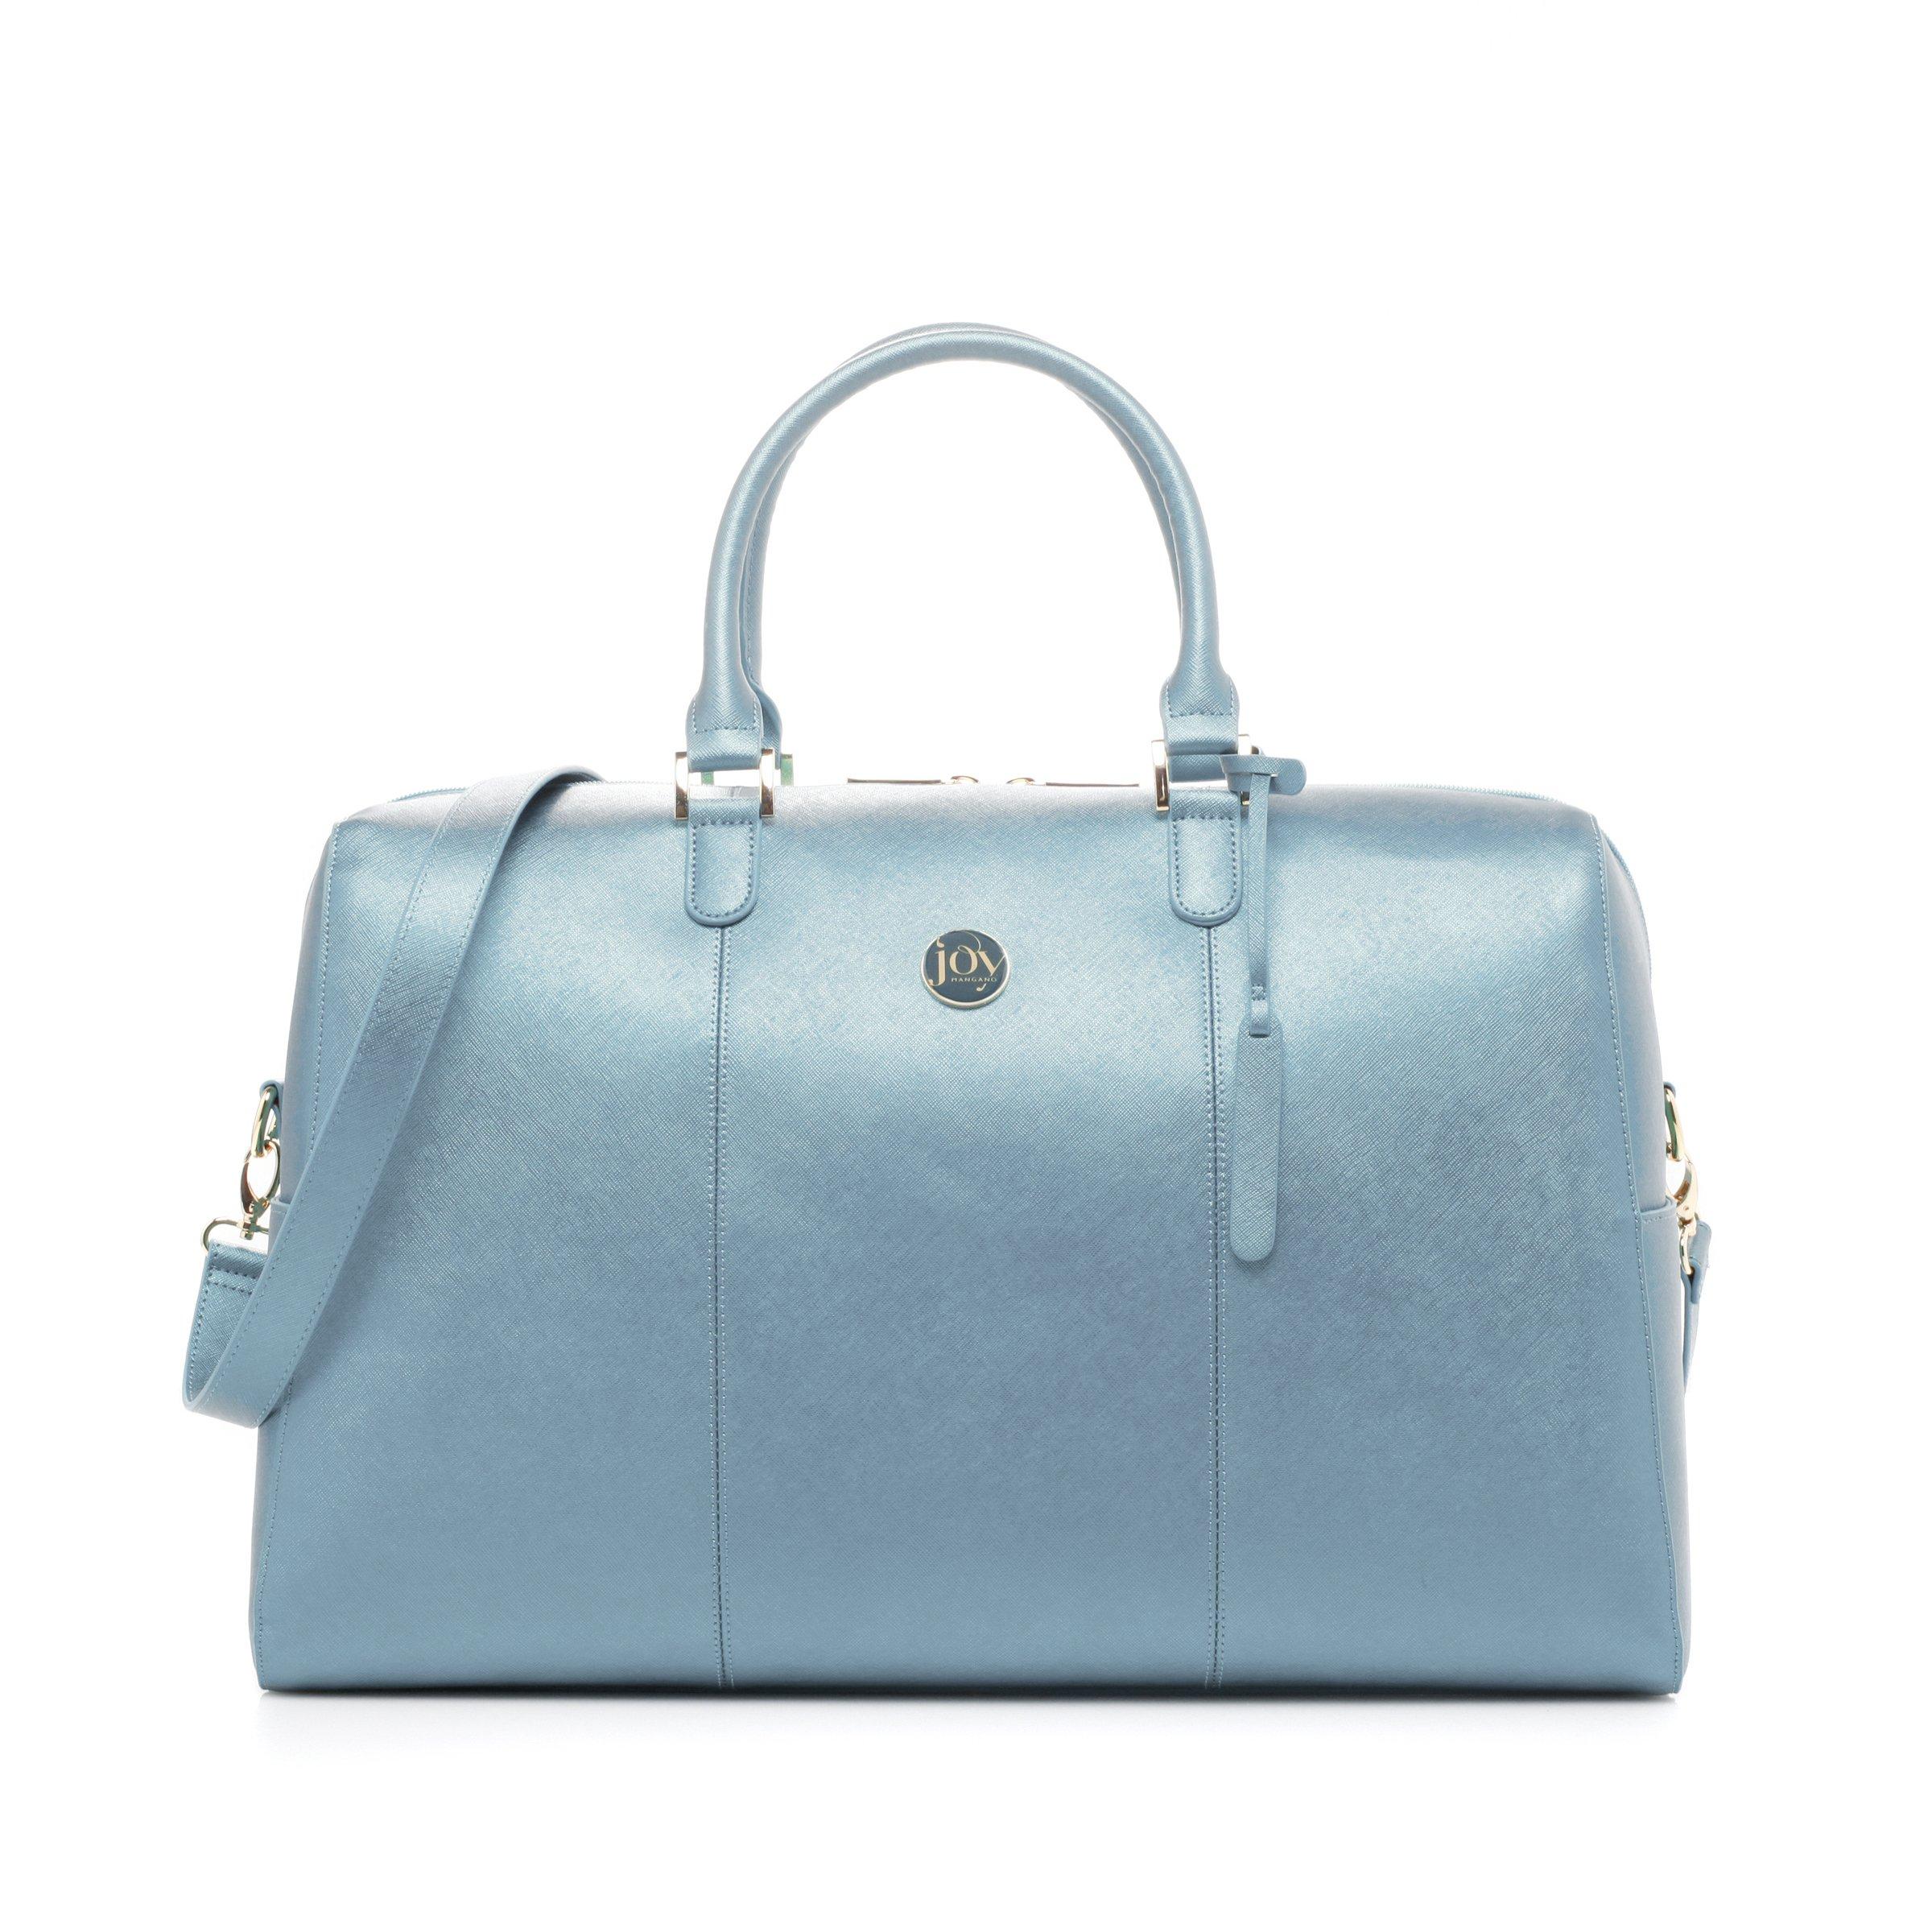 Joy Mangano Women's Jm Metallic Leather Weekender Steel Blue Bag, One Size